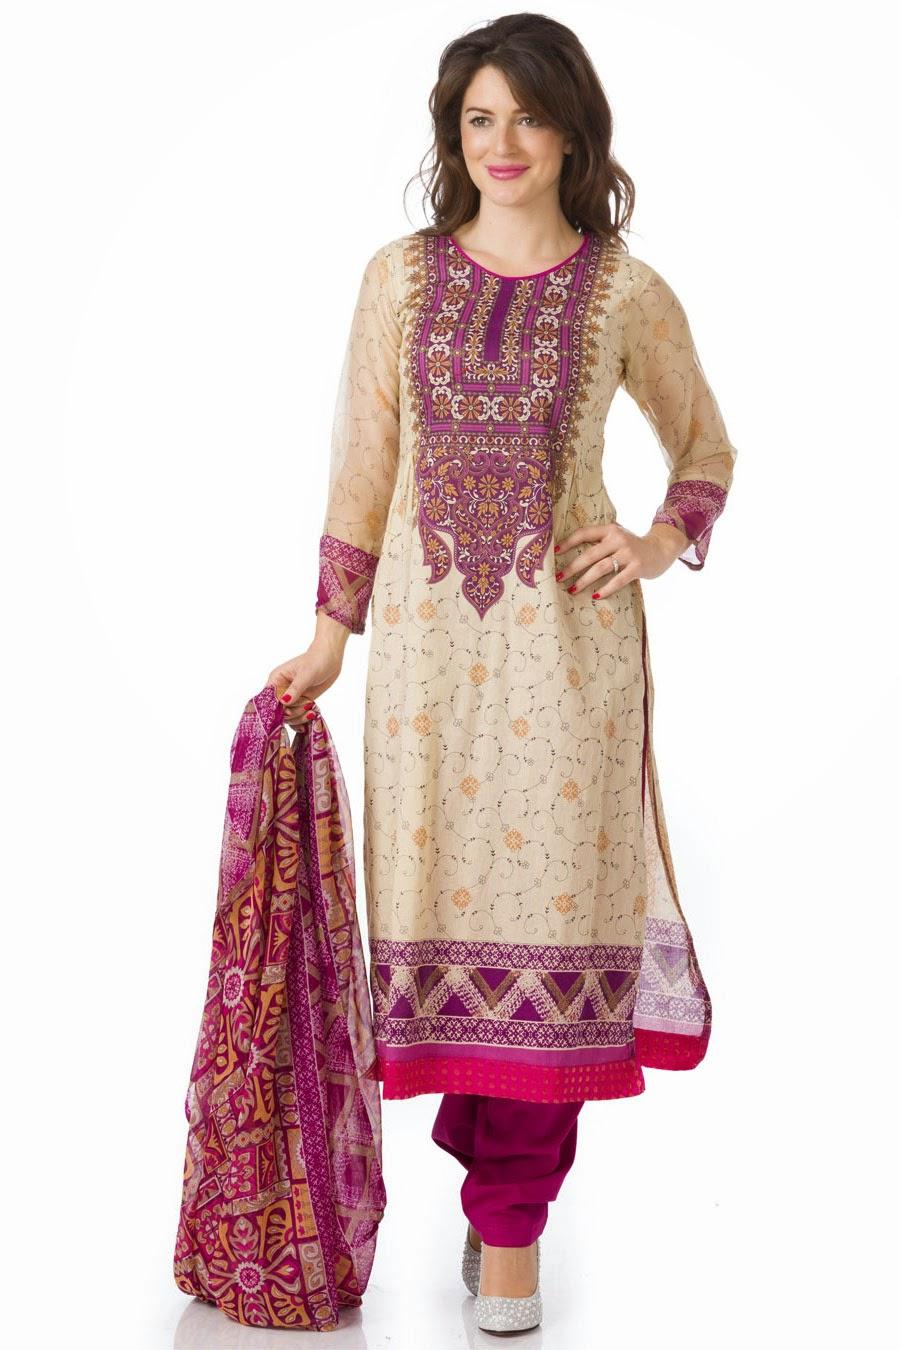 Elegant and Simple Salwar Kameez Designs